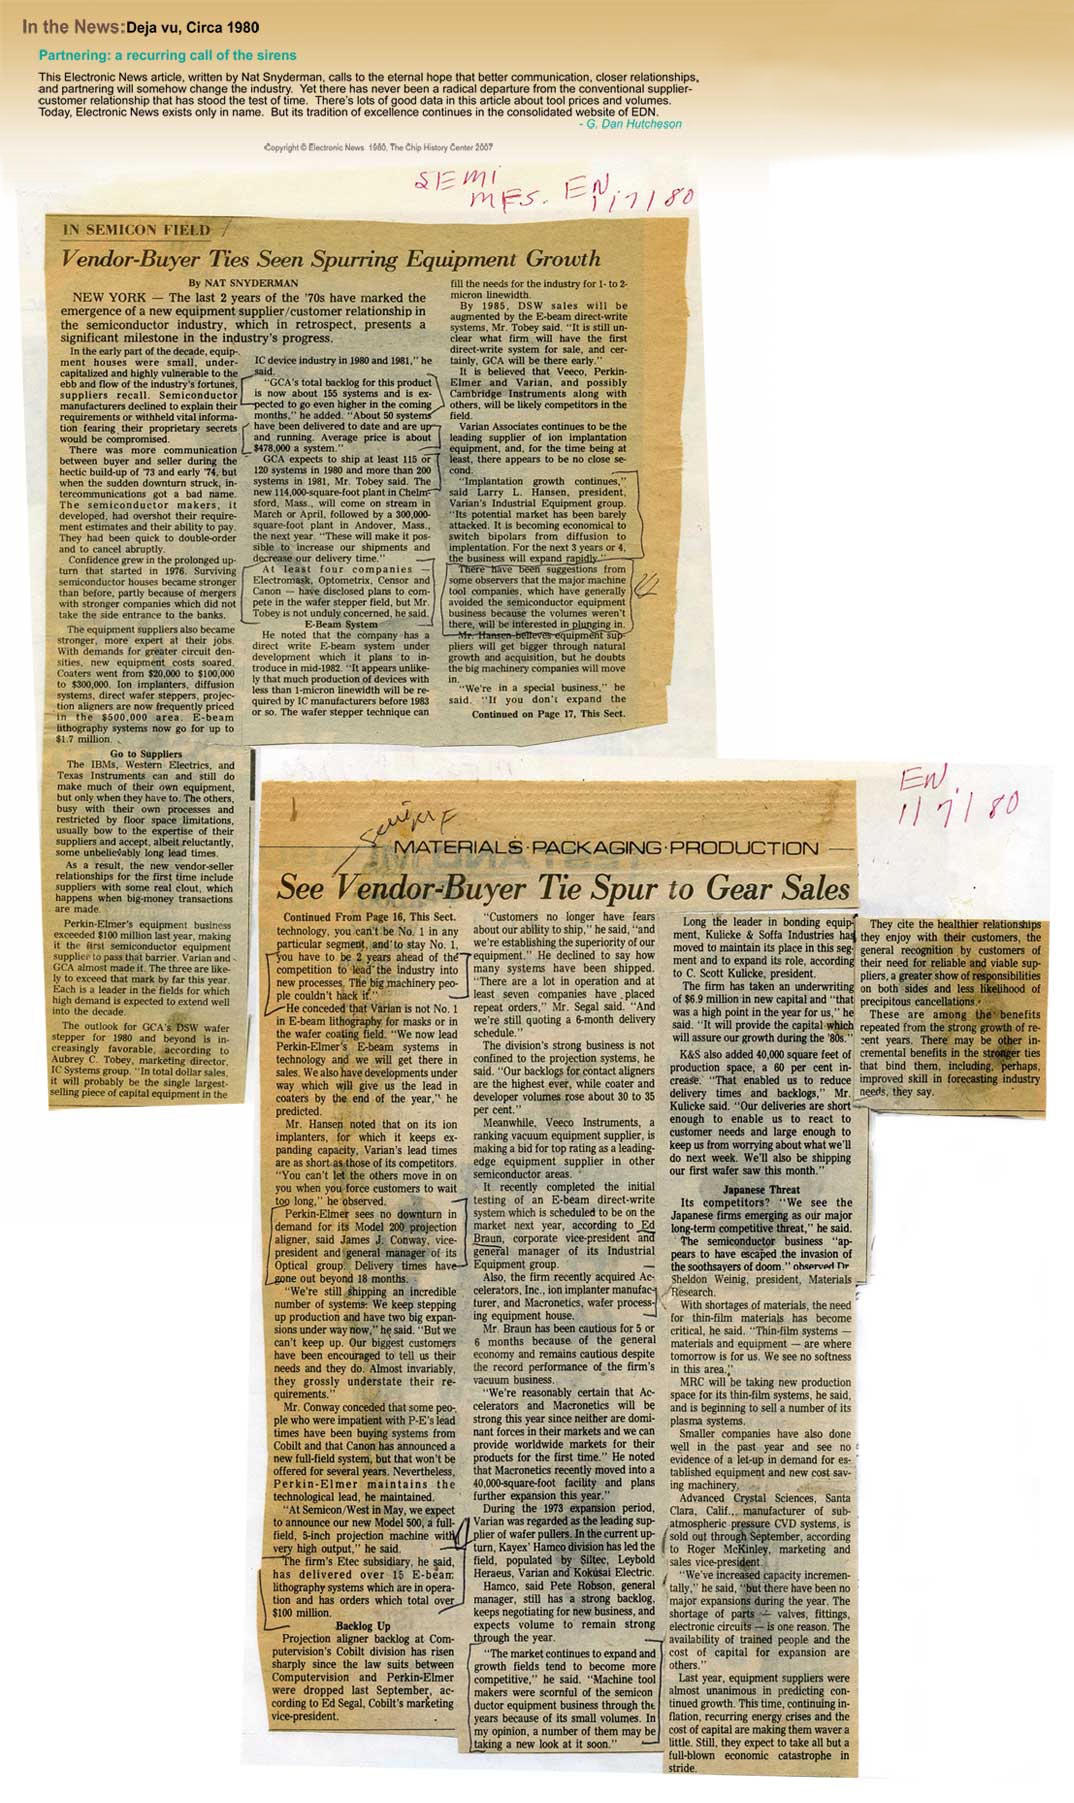 In the News: Deja vu, Circa 1980